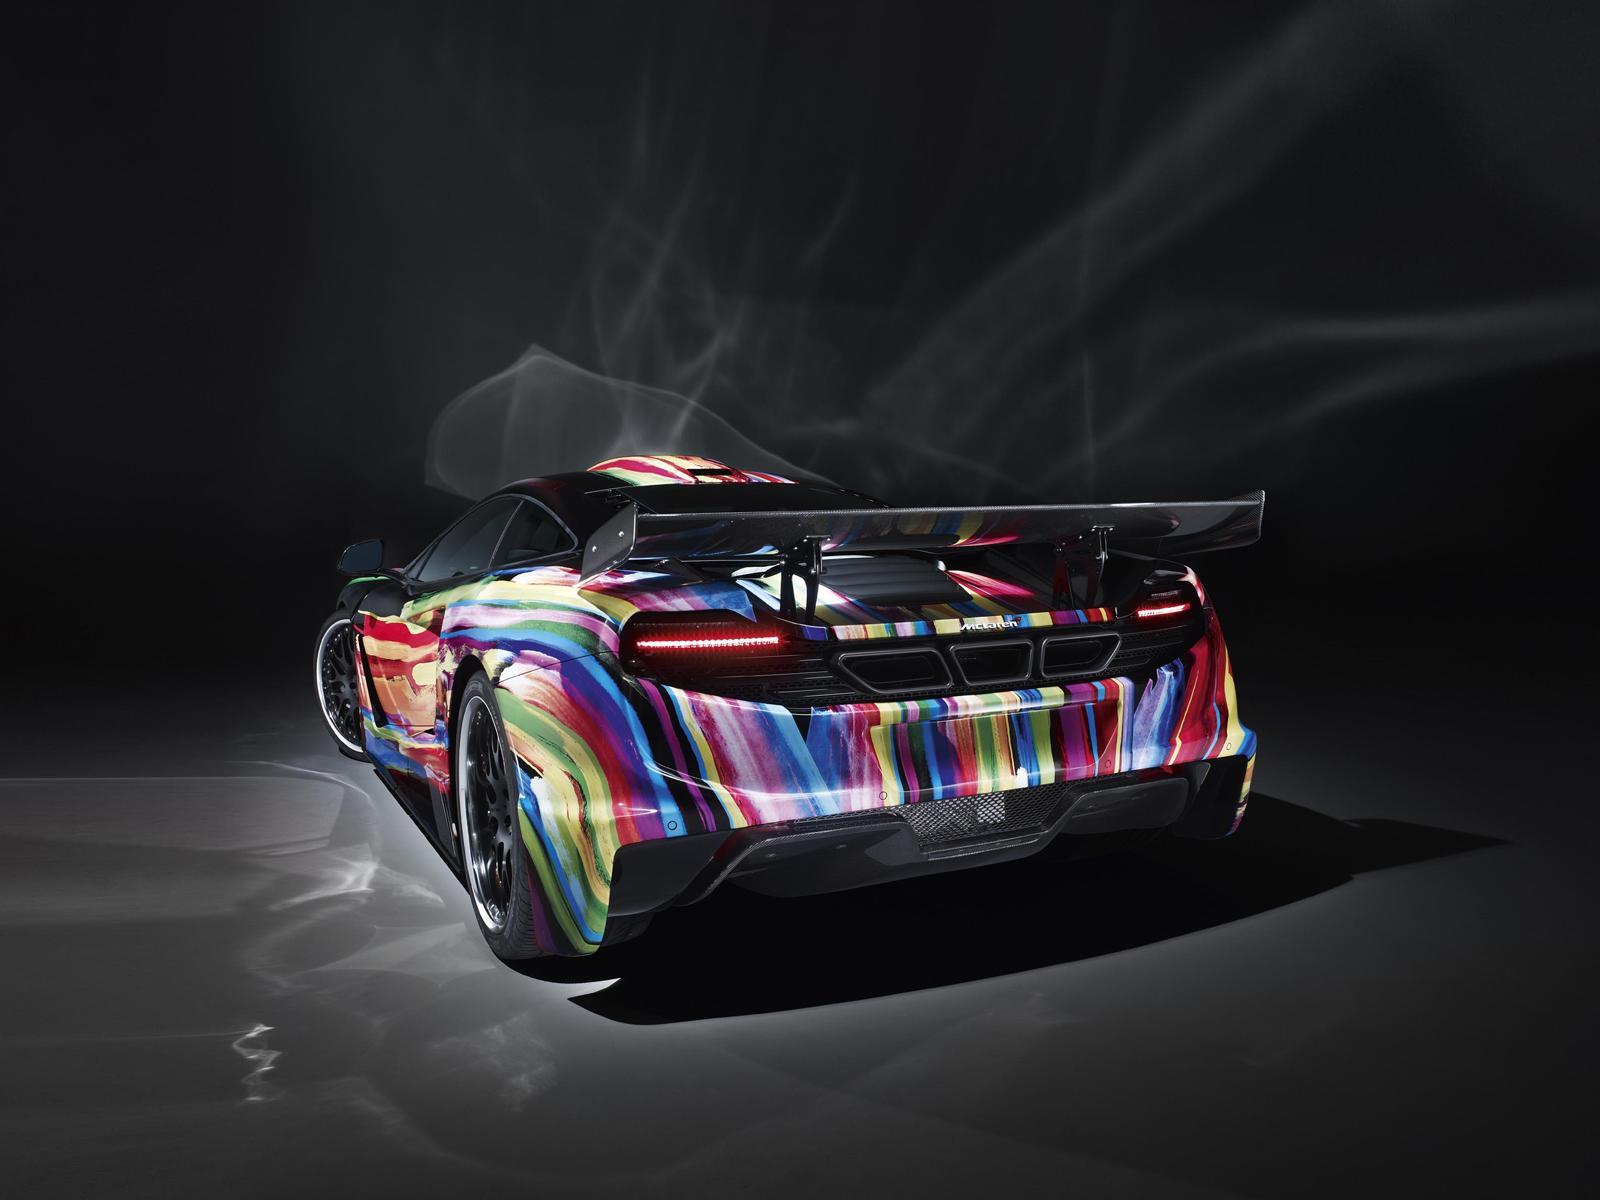 Hamann mclaren mp4 12c memor una colorida pieza de arte - Made in sport vitrolles ...